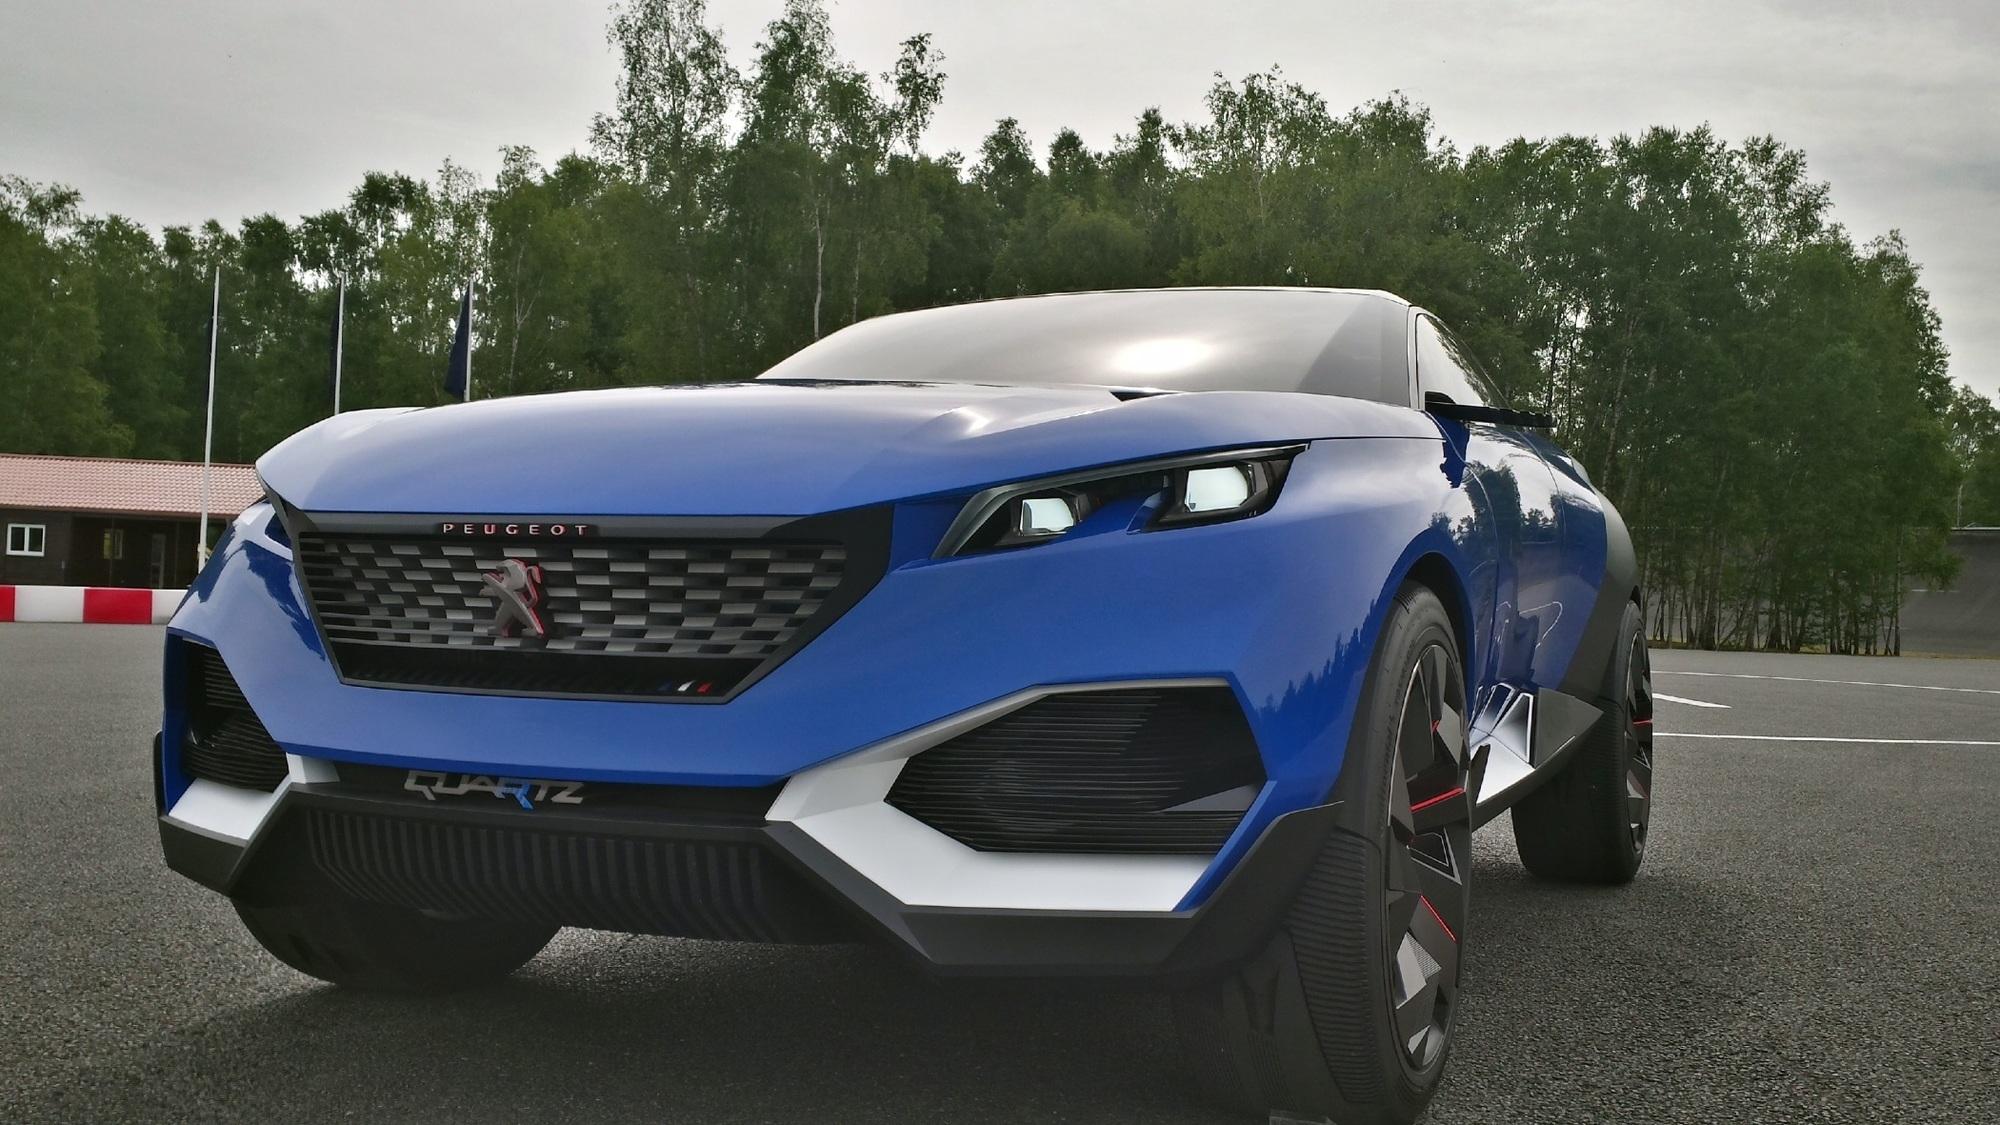 Peugeot-Concept-Cars - Die Strategie hinter der Show